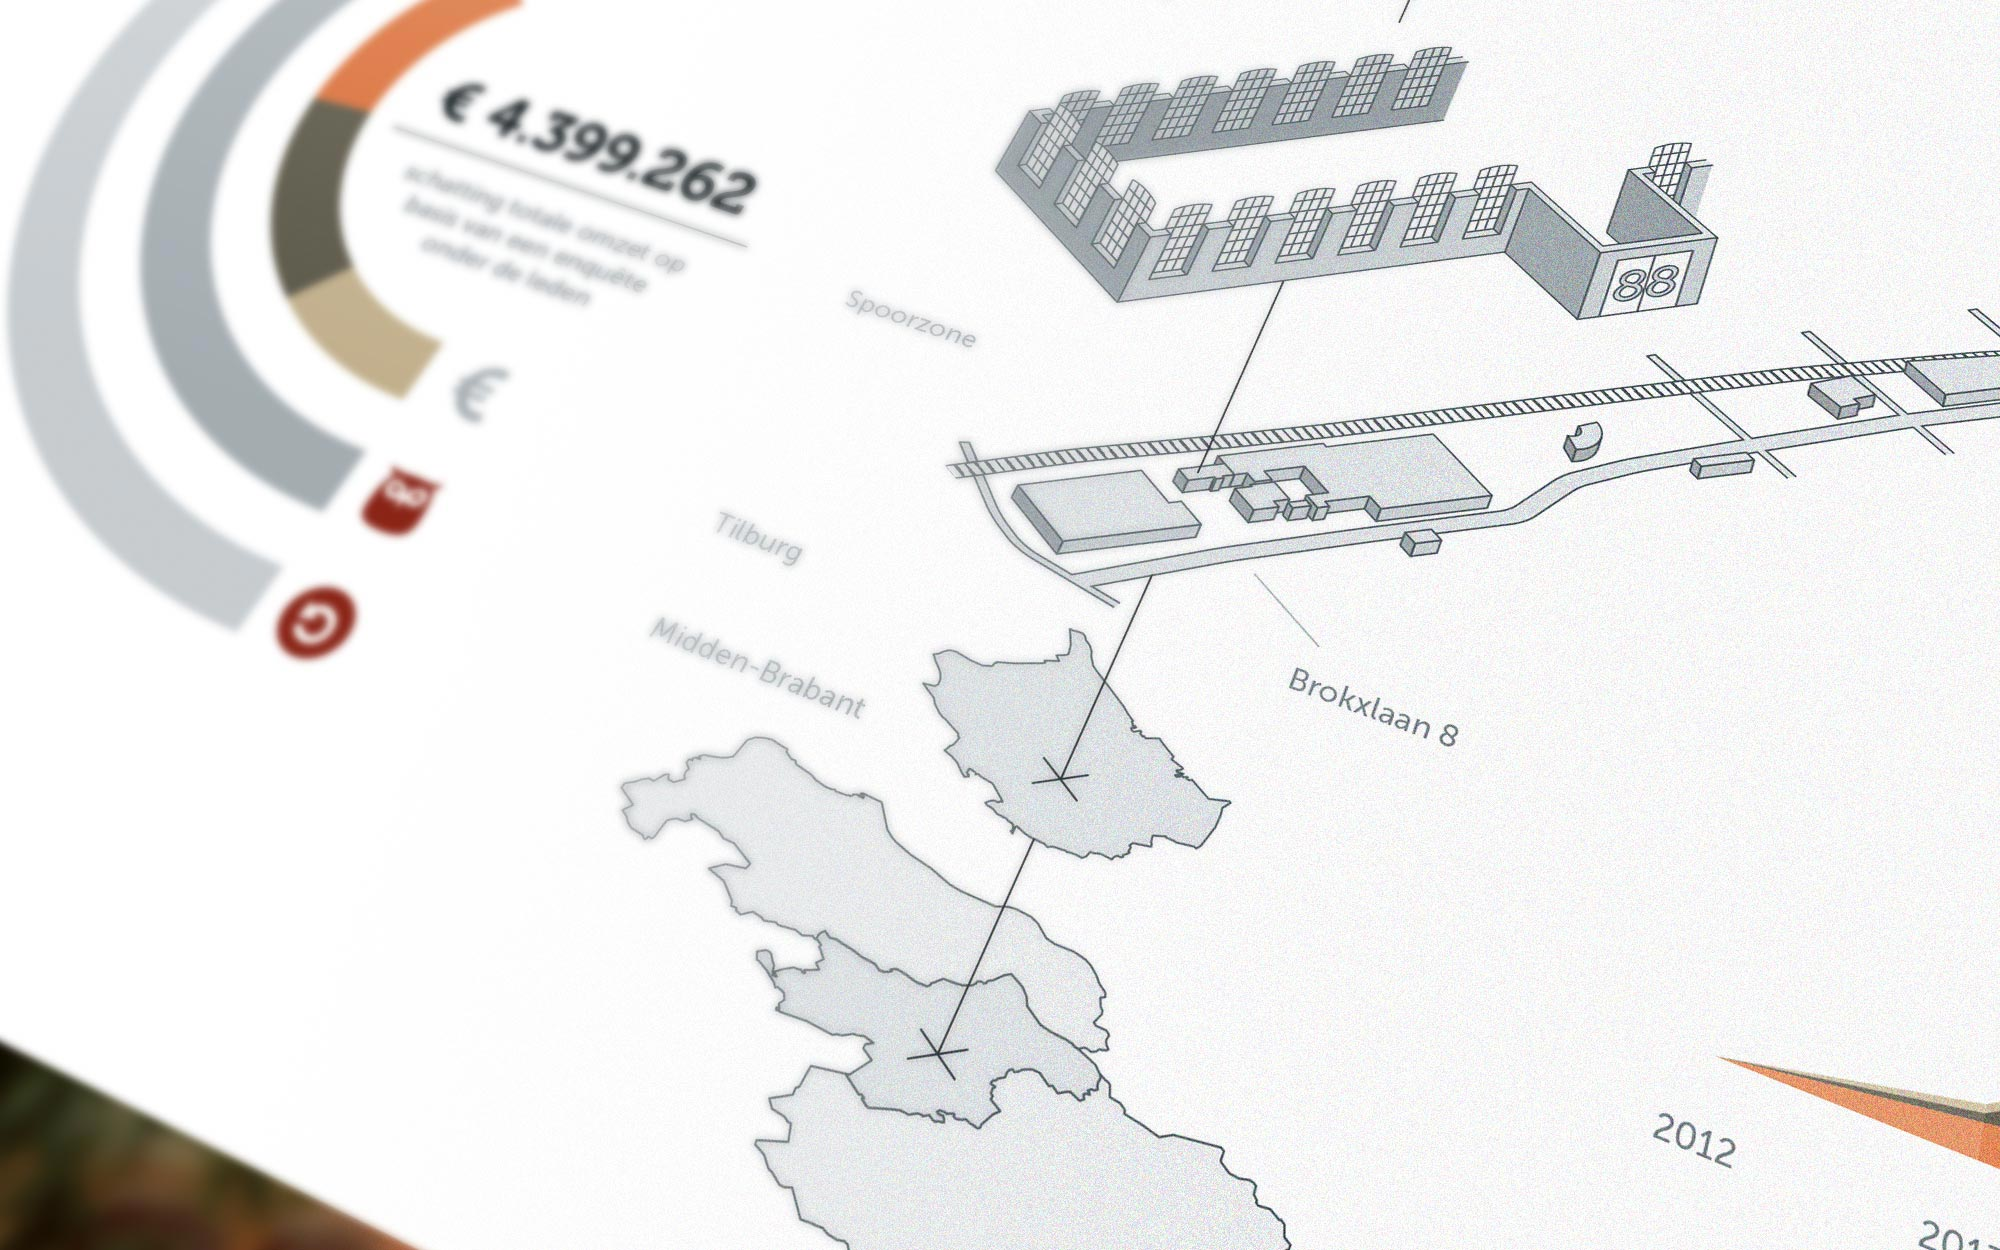 Samenstelling MCSI infographic JAgd ontwerp detail 2